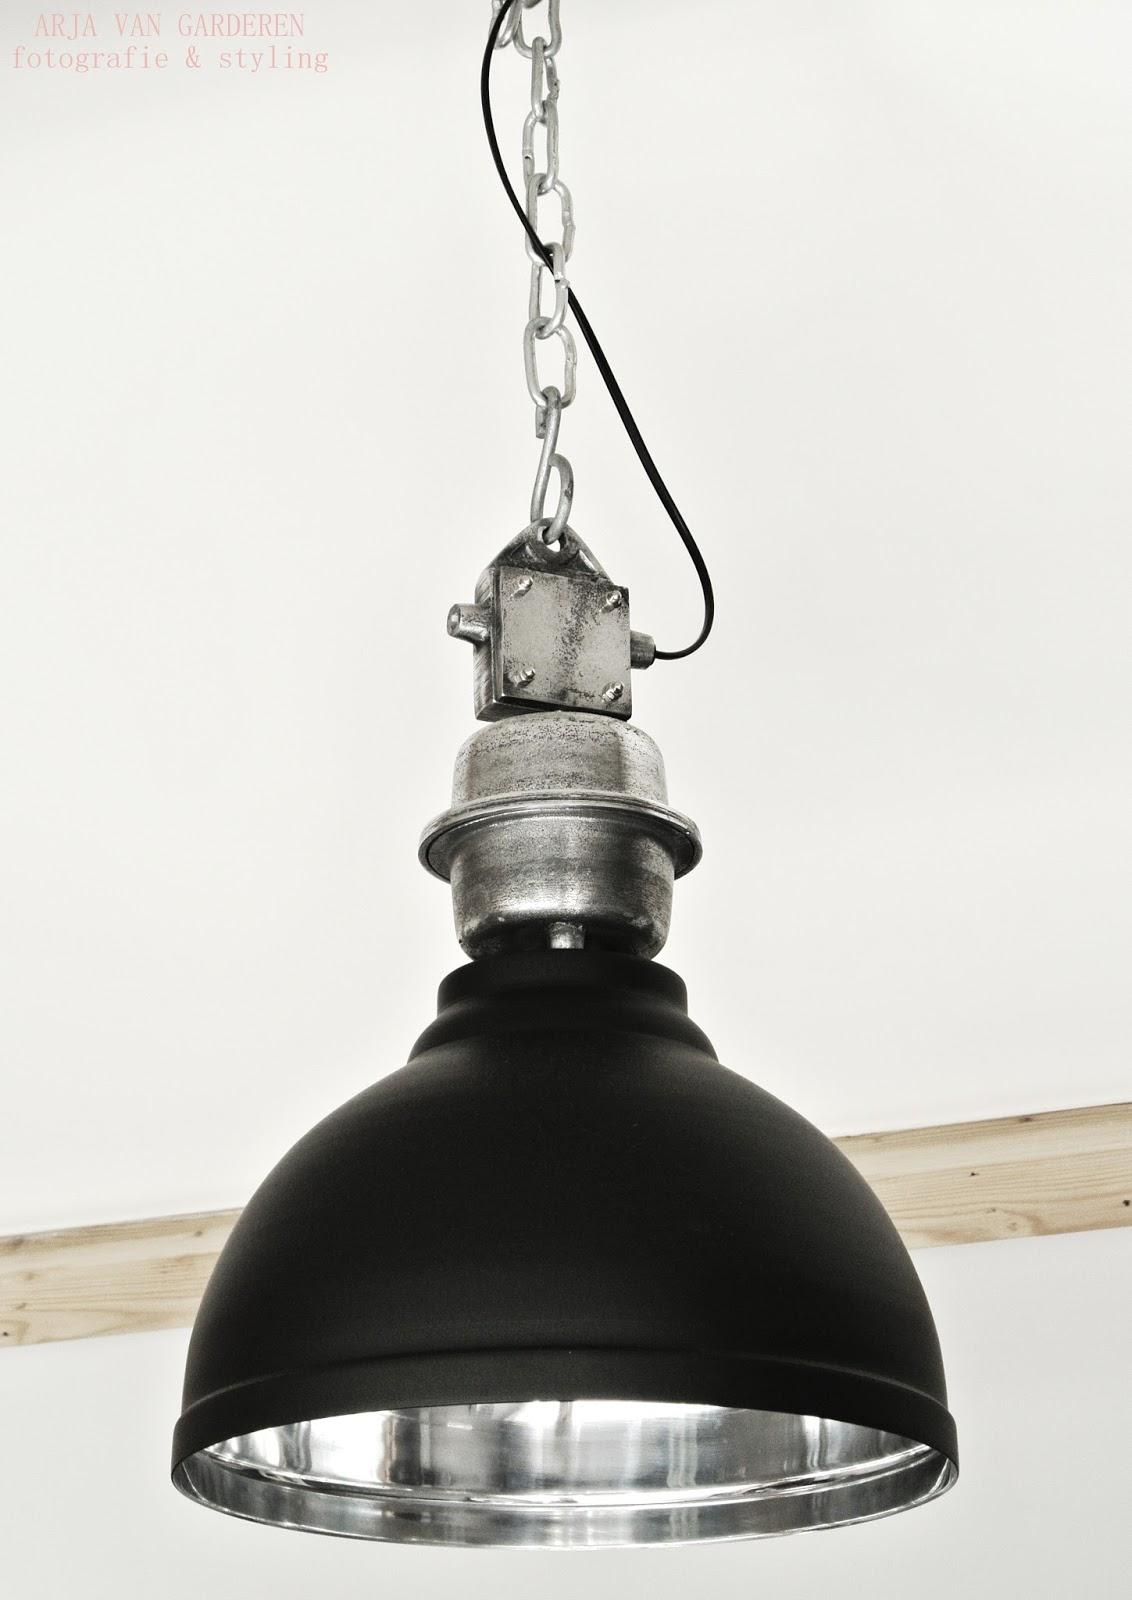 zwh.nl stoere lamp  onze slaapzolder, Meubels Ideeën